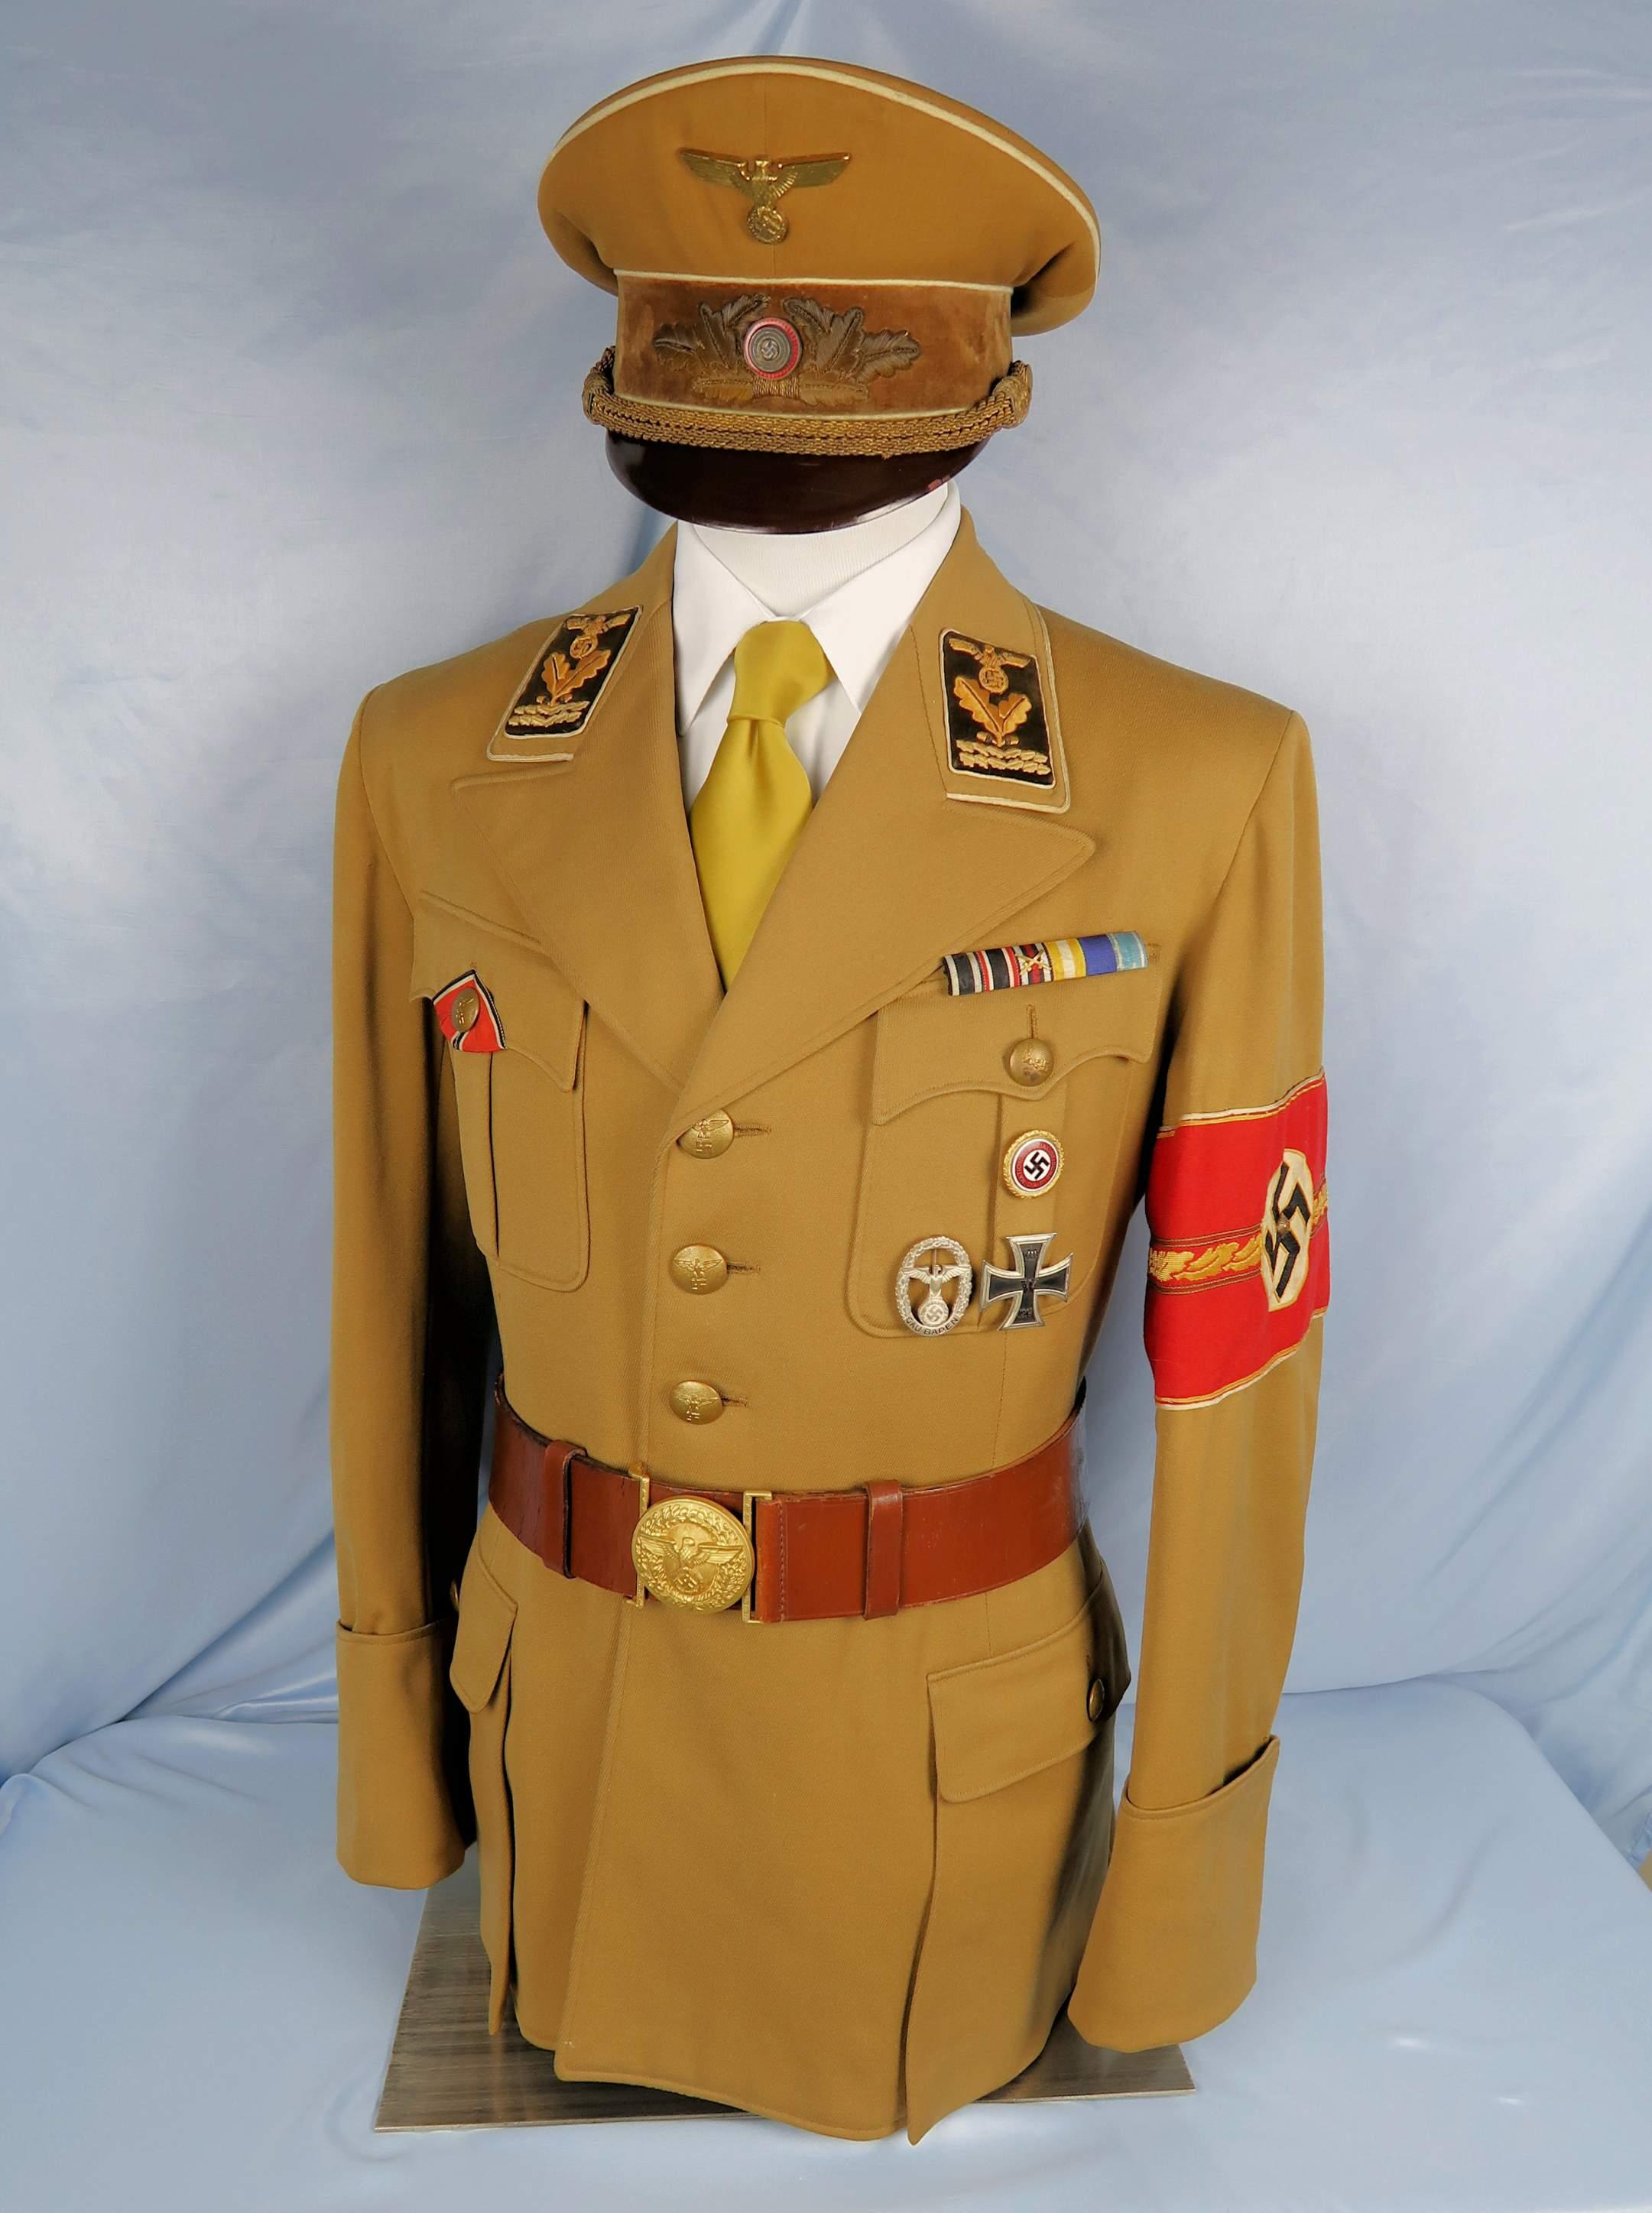 NSDAP Kreis level Hauptbereichsleiter tunic display